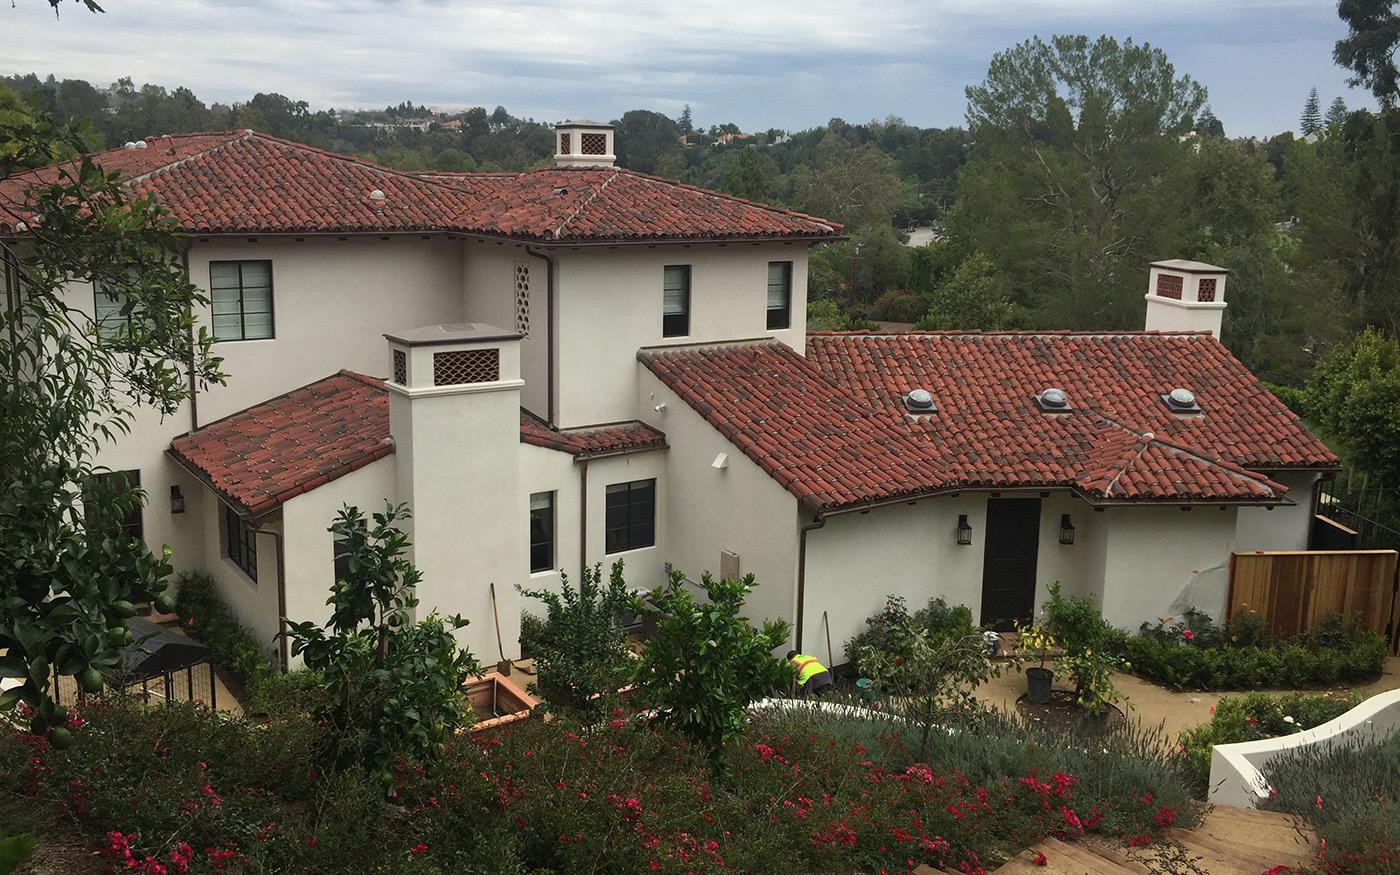 Los Angeles Roofing Contractor Roof Repair Estimates